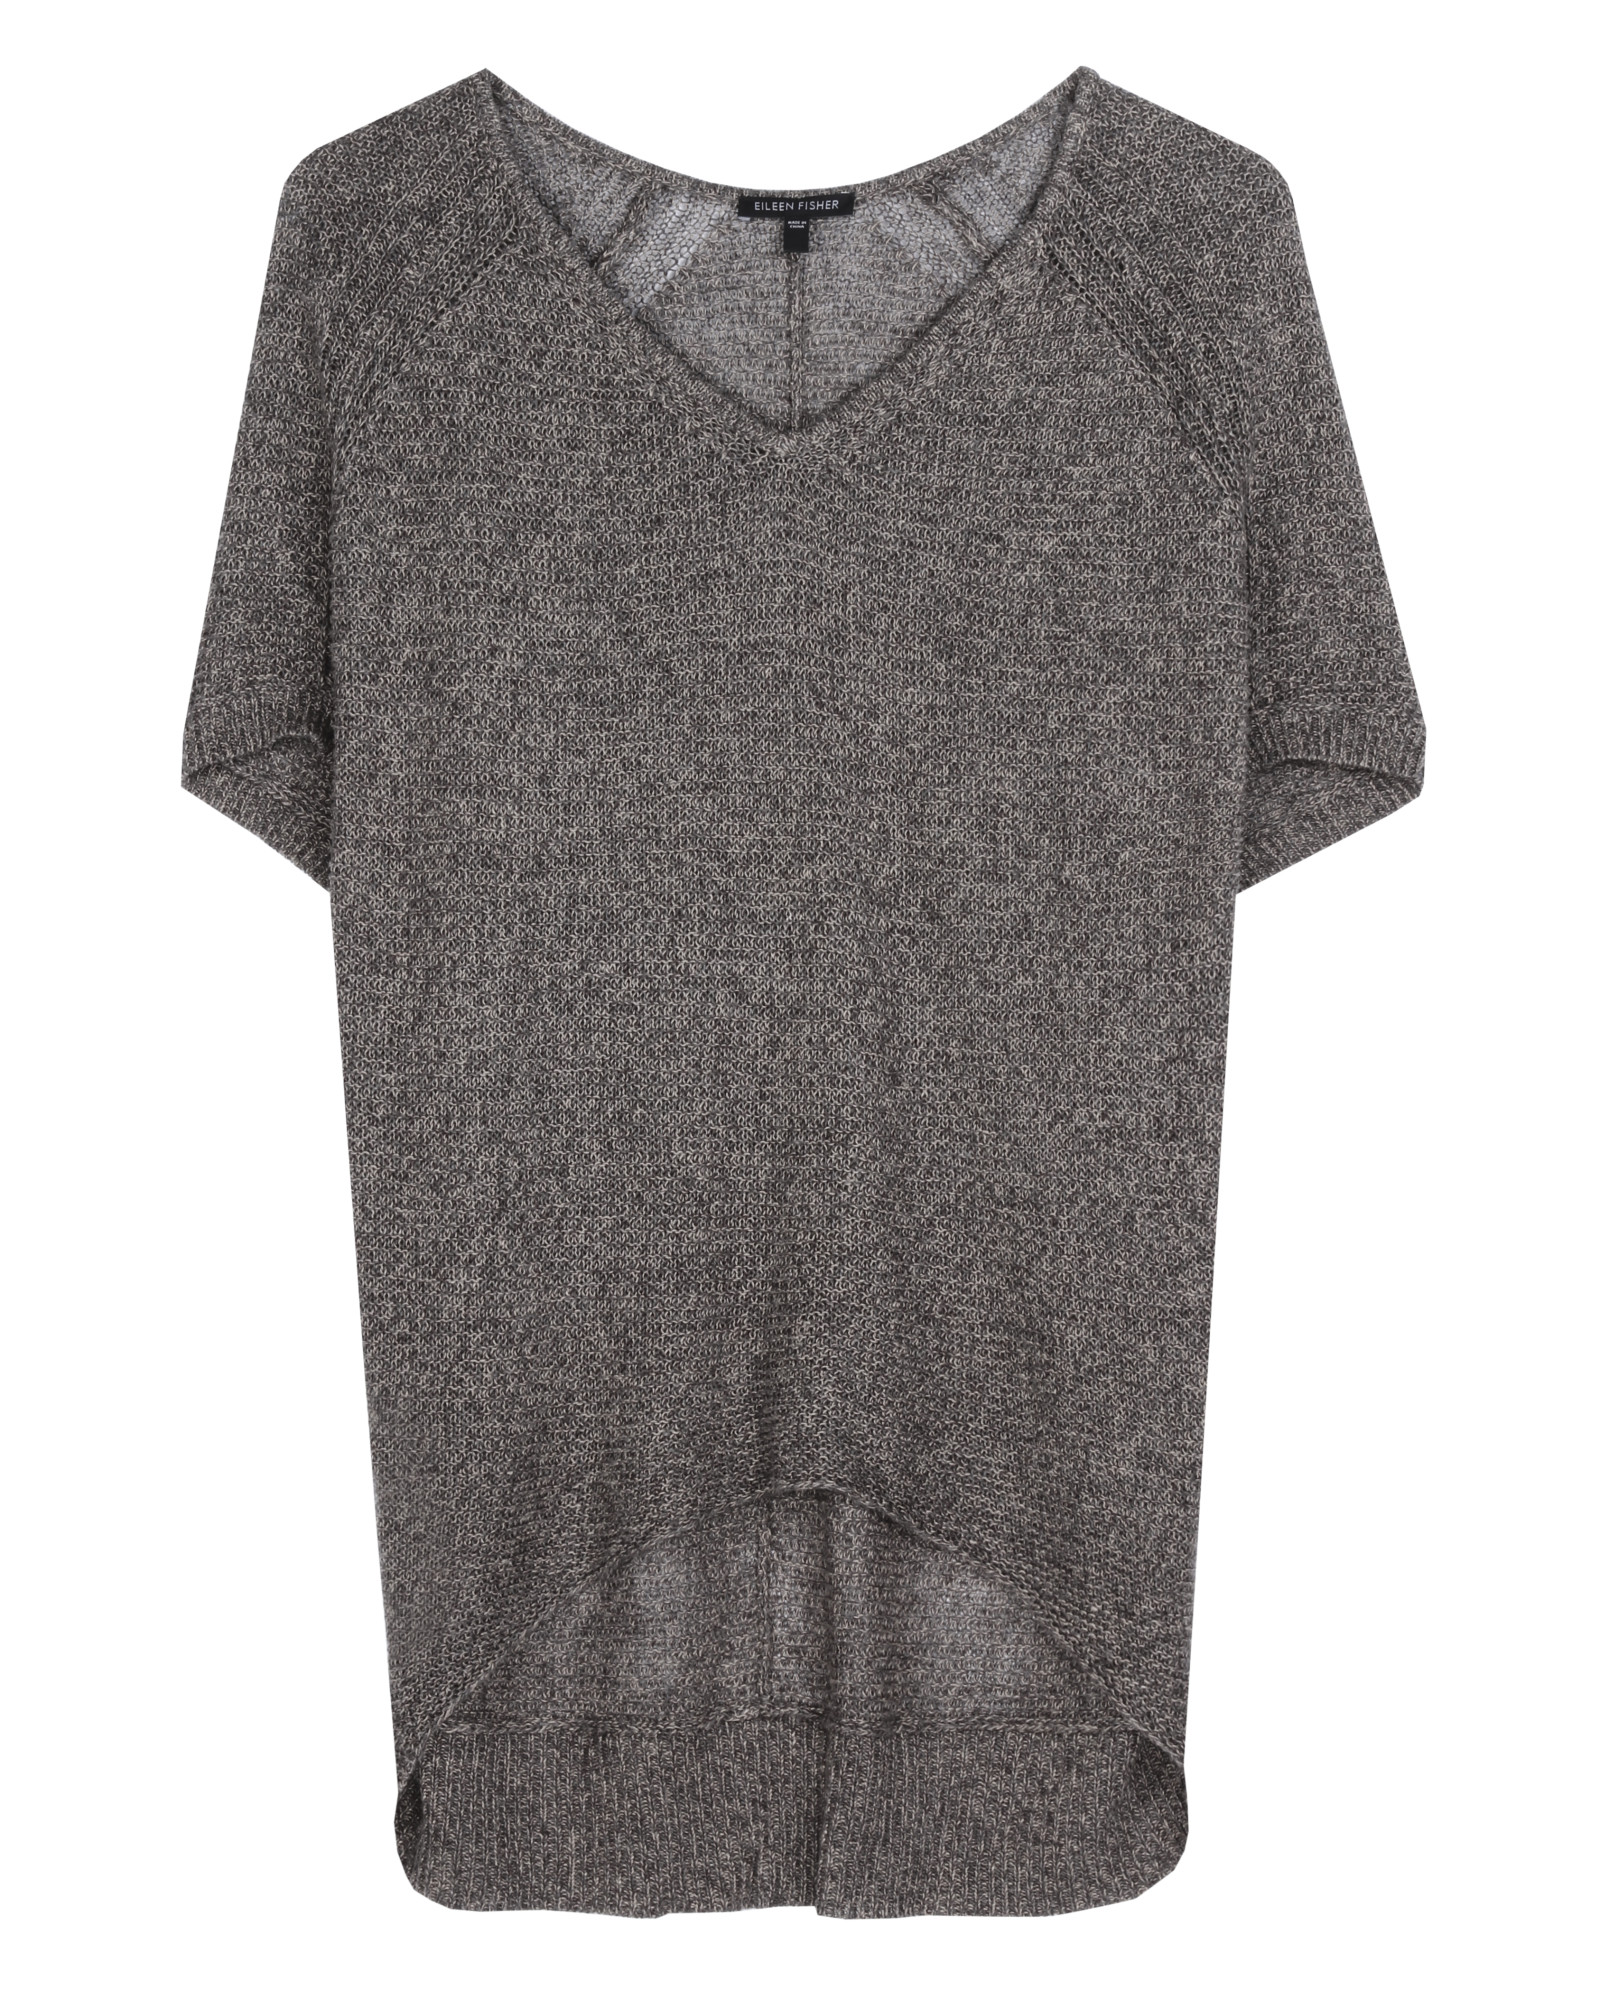 Multi-Tonal Mesh [Multi-Tonal Linen] Pullover